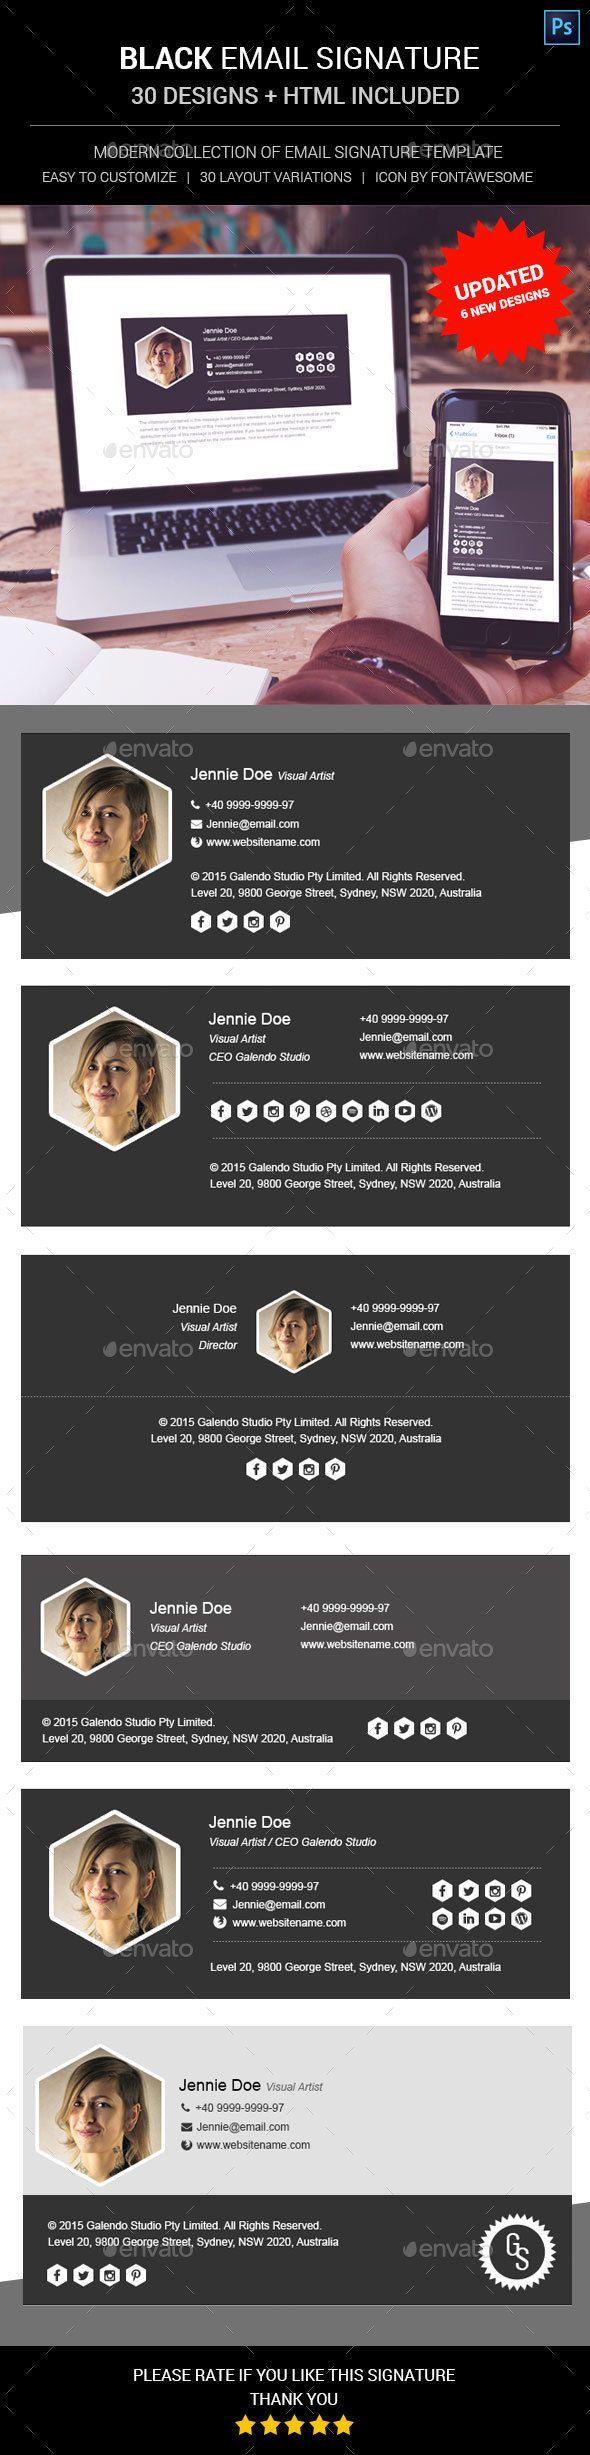 Black Email Signature | Email signatures, Email signature templates ...